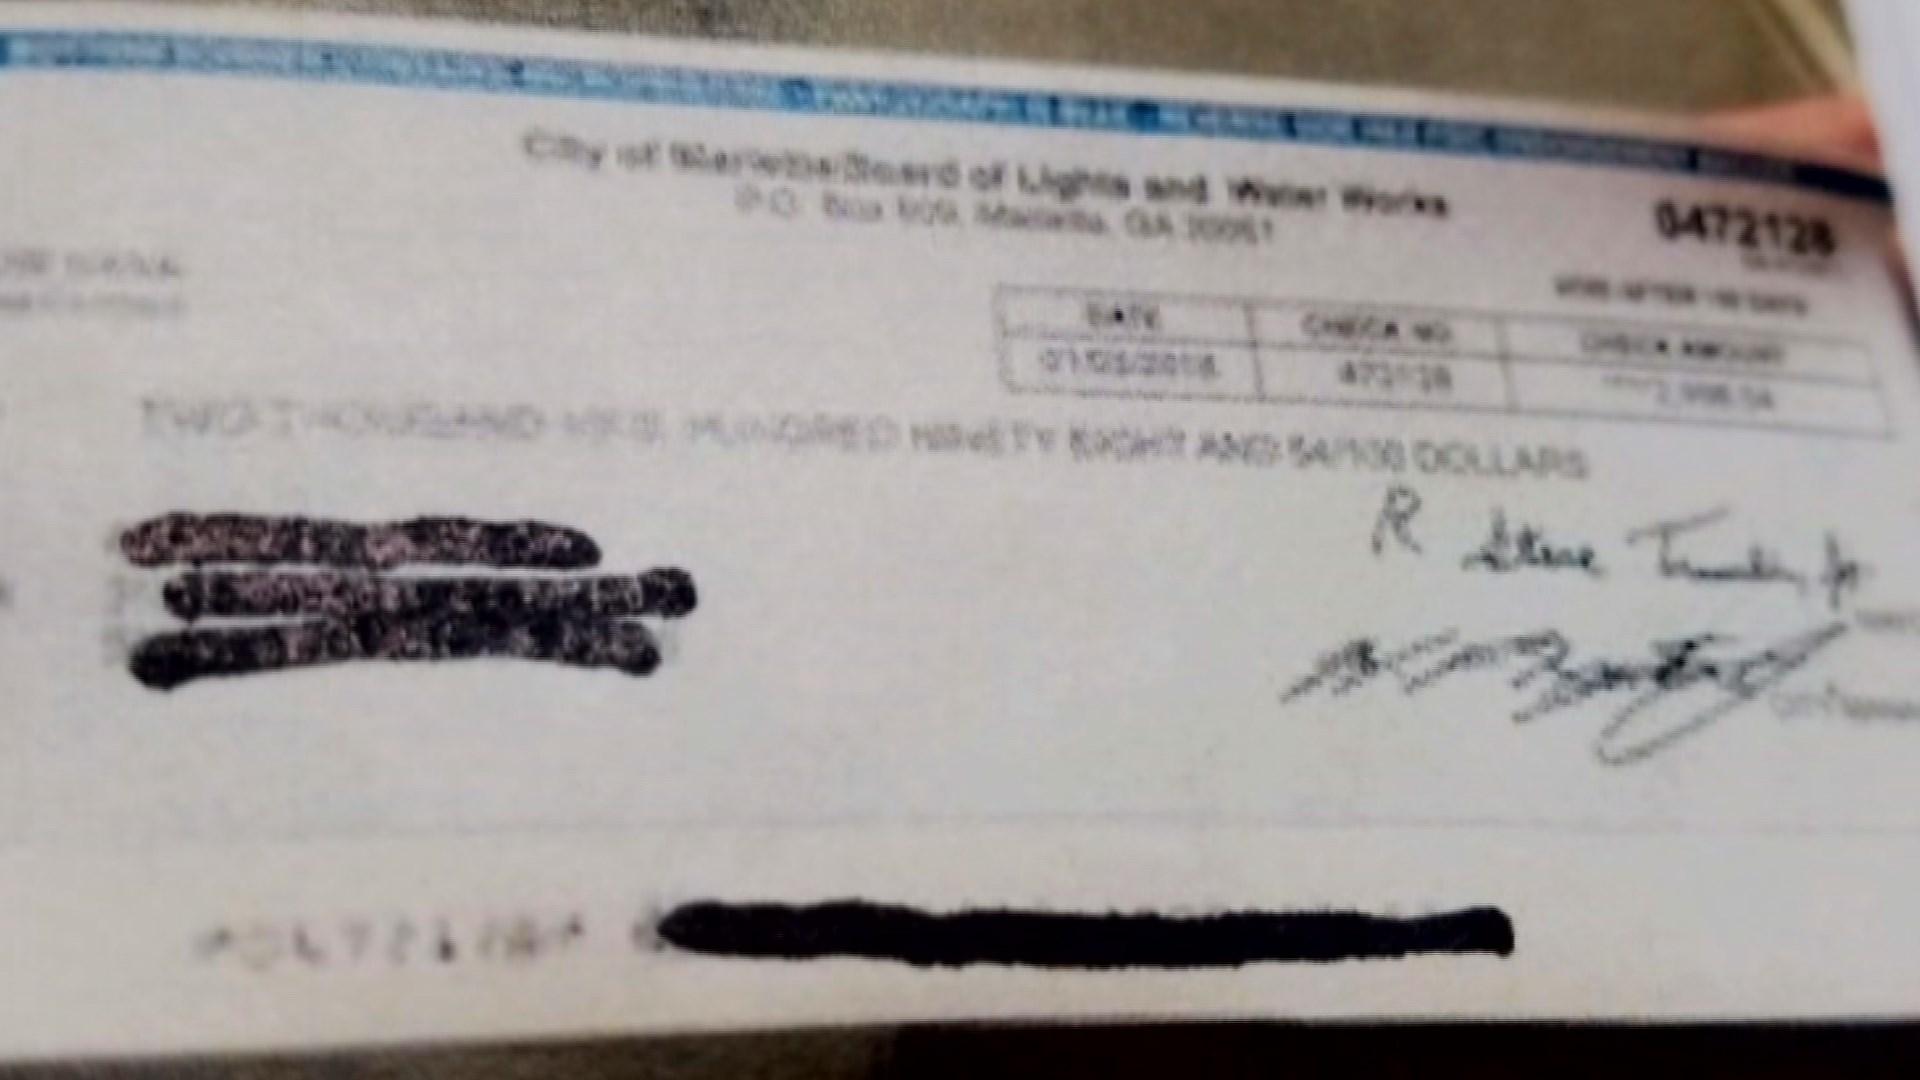 one of the fake checks